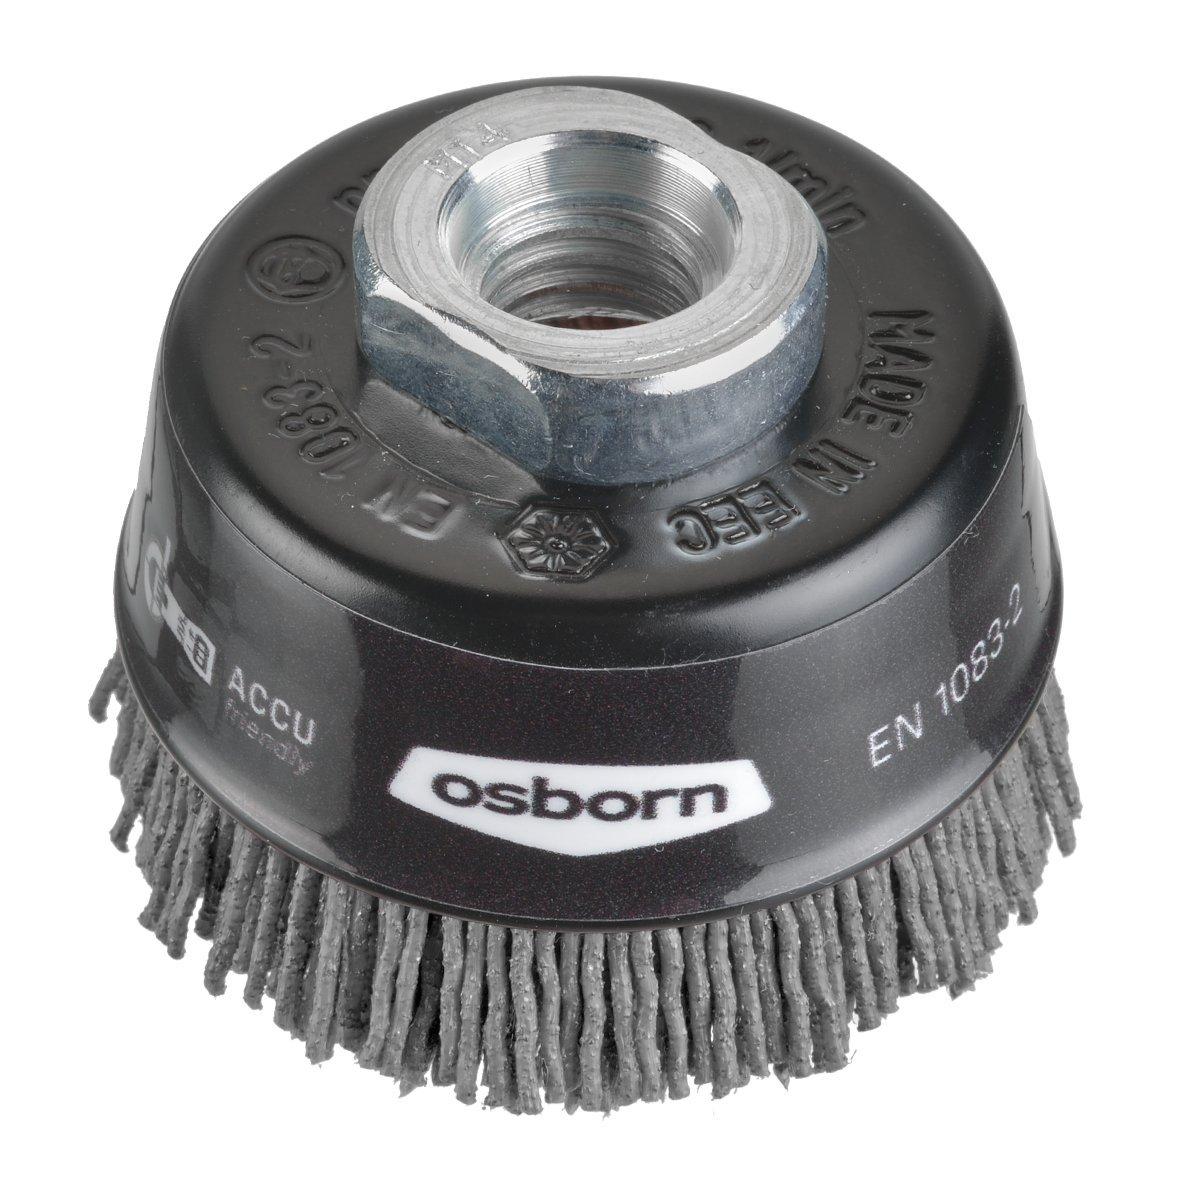 Osborn Neuhheit Topfbü rste fü r Akku-Winkelschleifer 115 mm, D 60 mm, 1 Stü ck, 6802613891 Osborn International GmbH